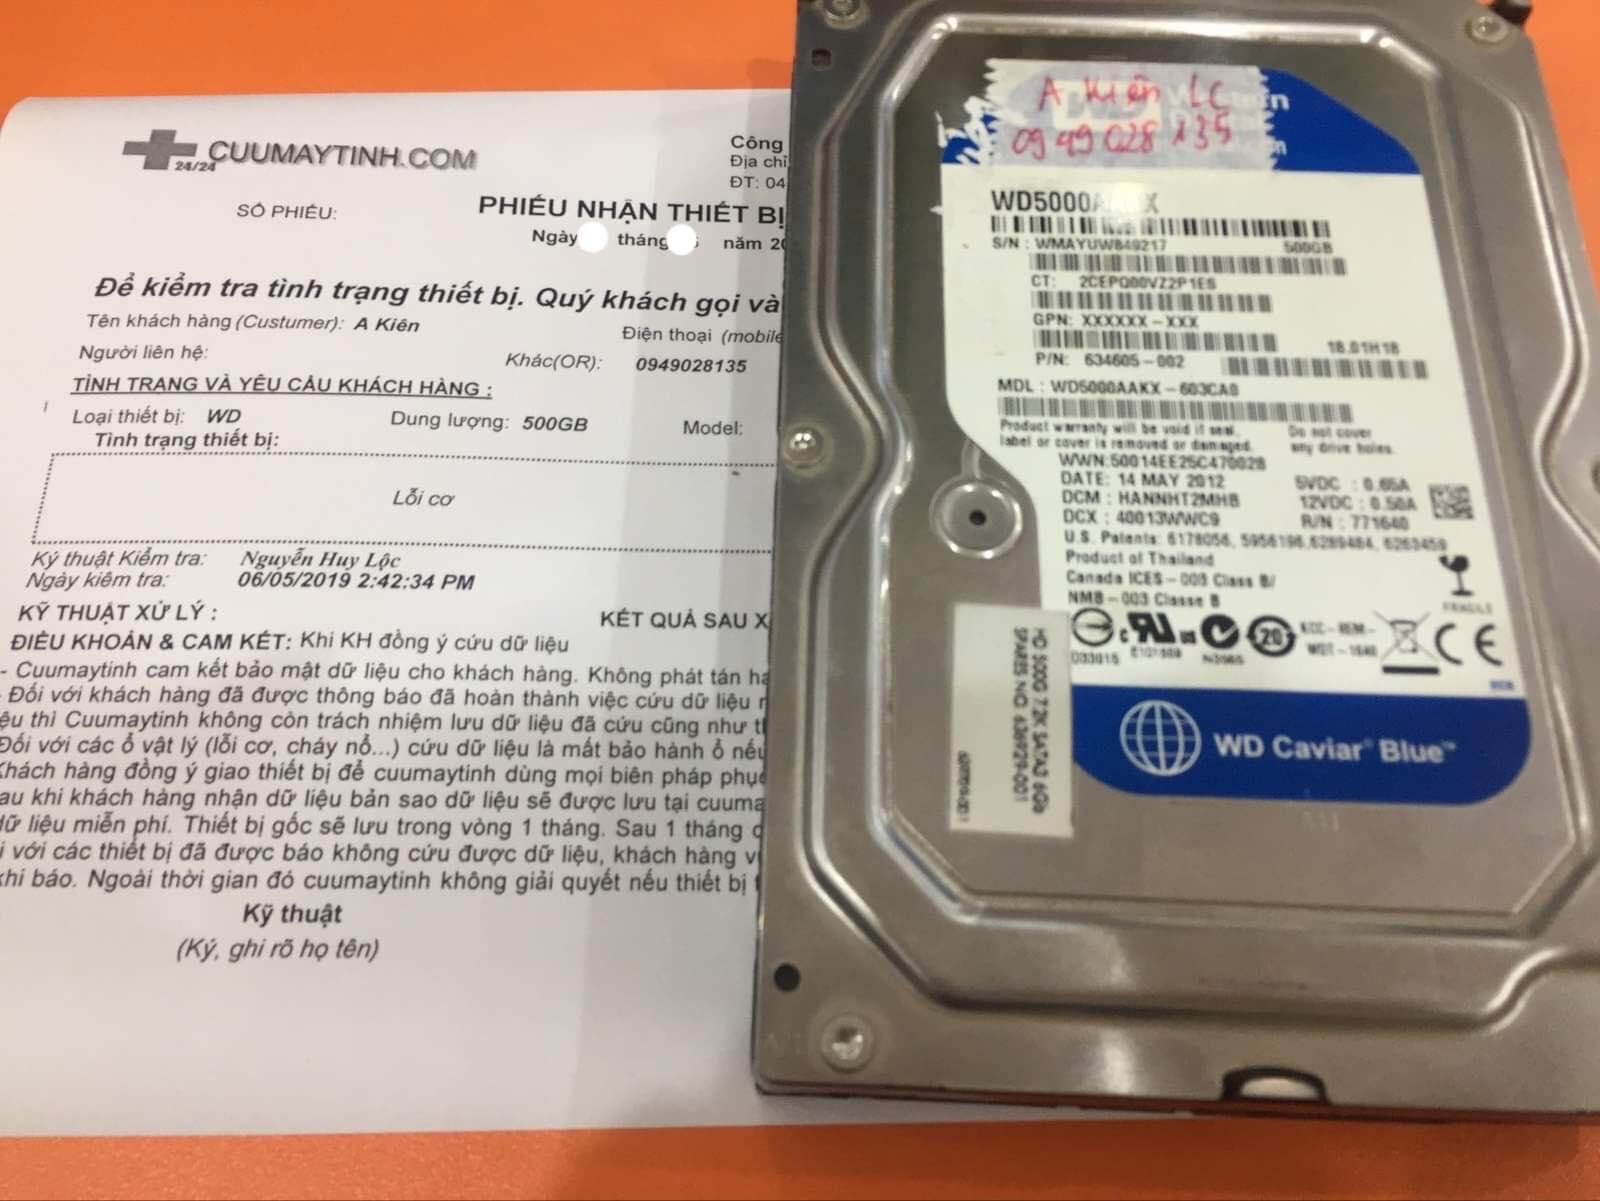 Cứu dữ liệu ổ cứng Western 500GB lỗi cơ 24/07/2019 - cuumaytinh